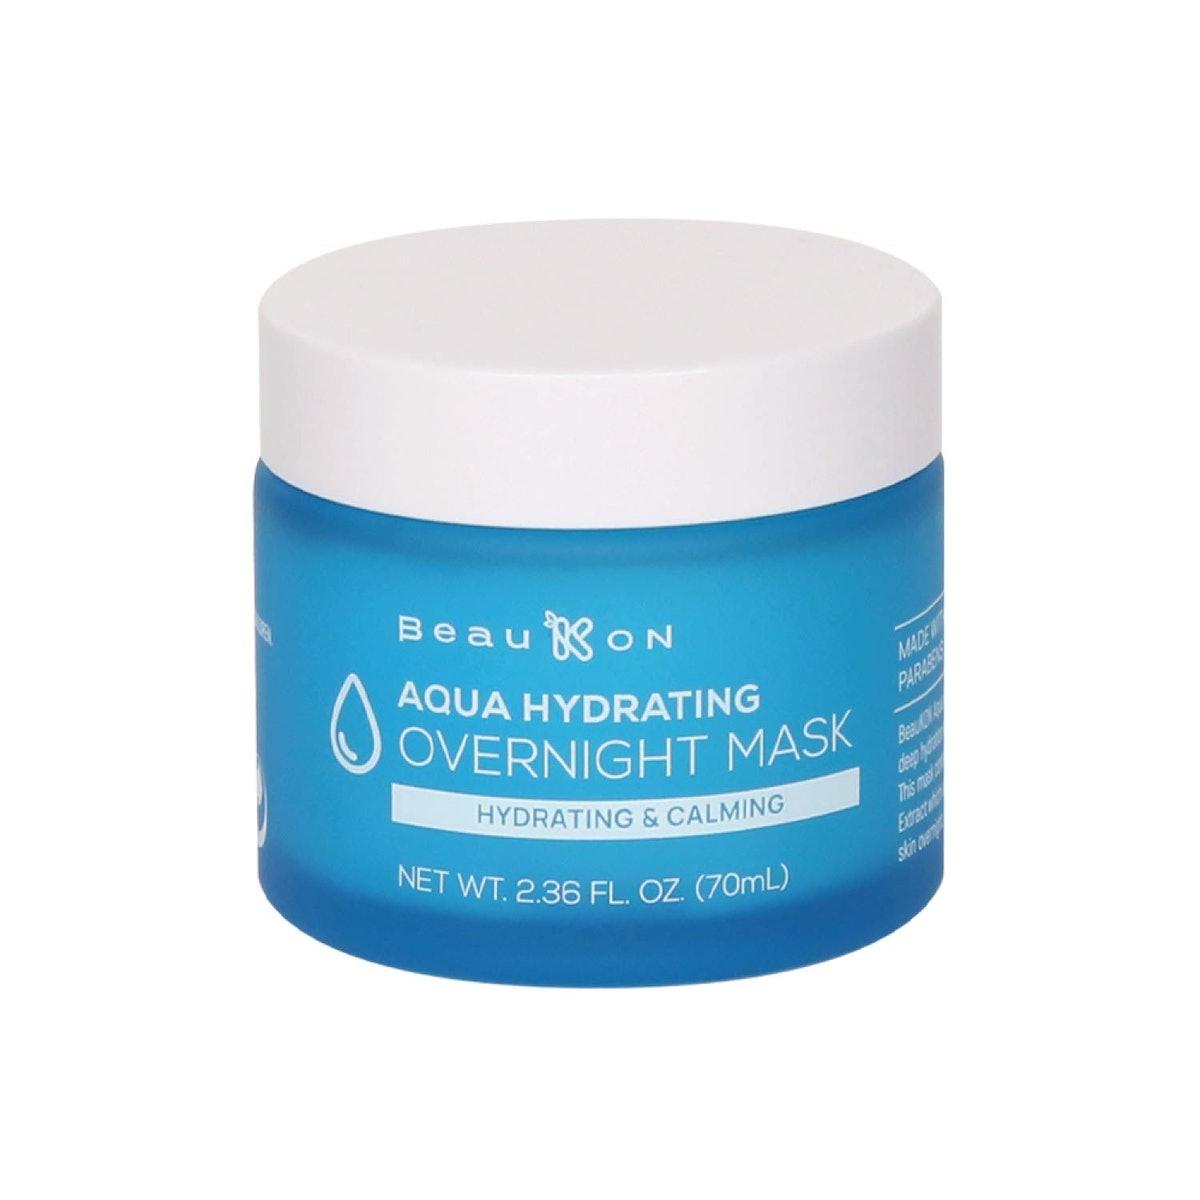 BeauKON Aqua Hydrating Overnight Mask